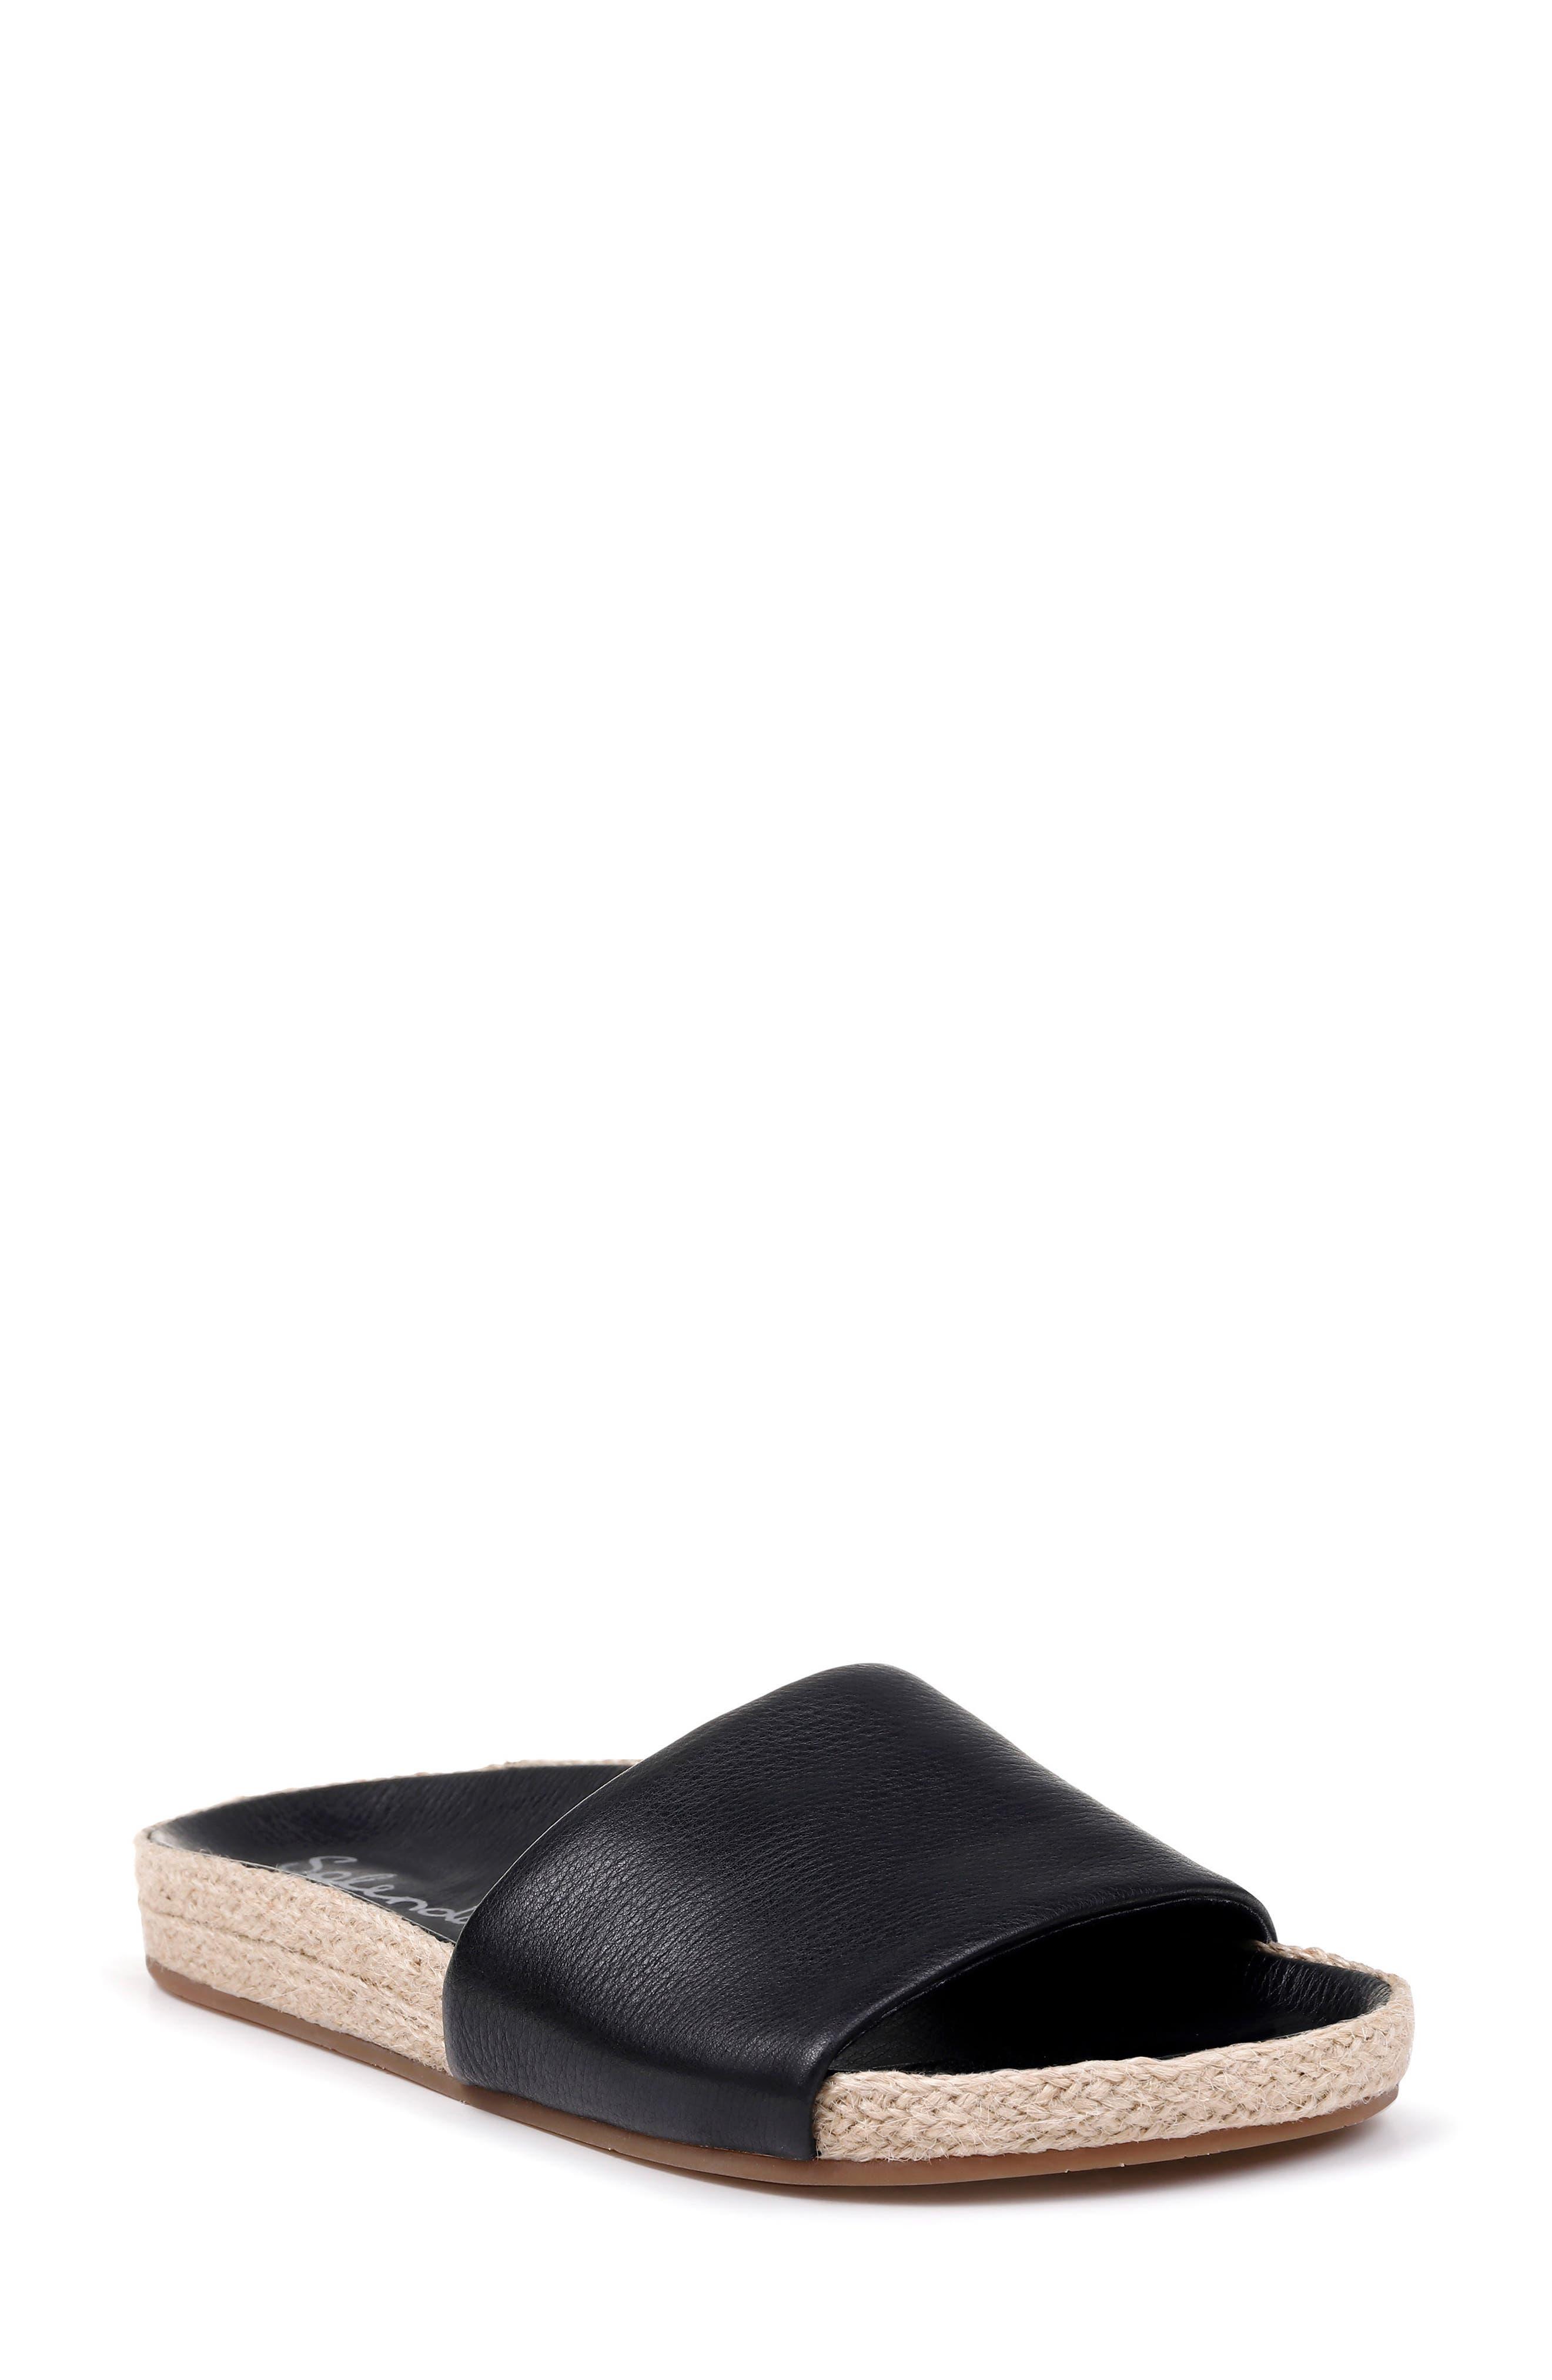 SPLENDID, Sandford Espadrille Slide Sandal, Main thumbnail 1, color, BLACK LEATHER